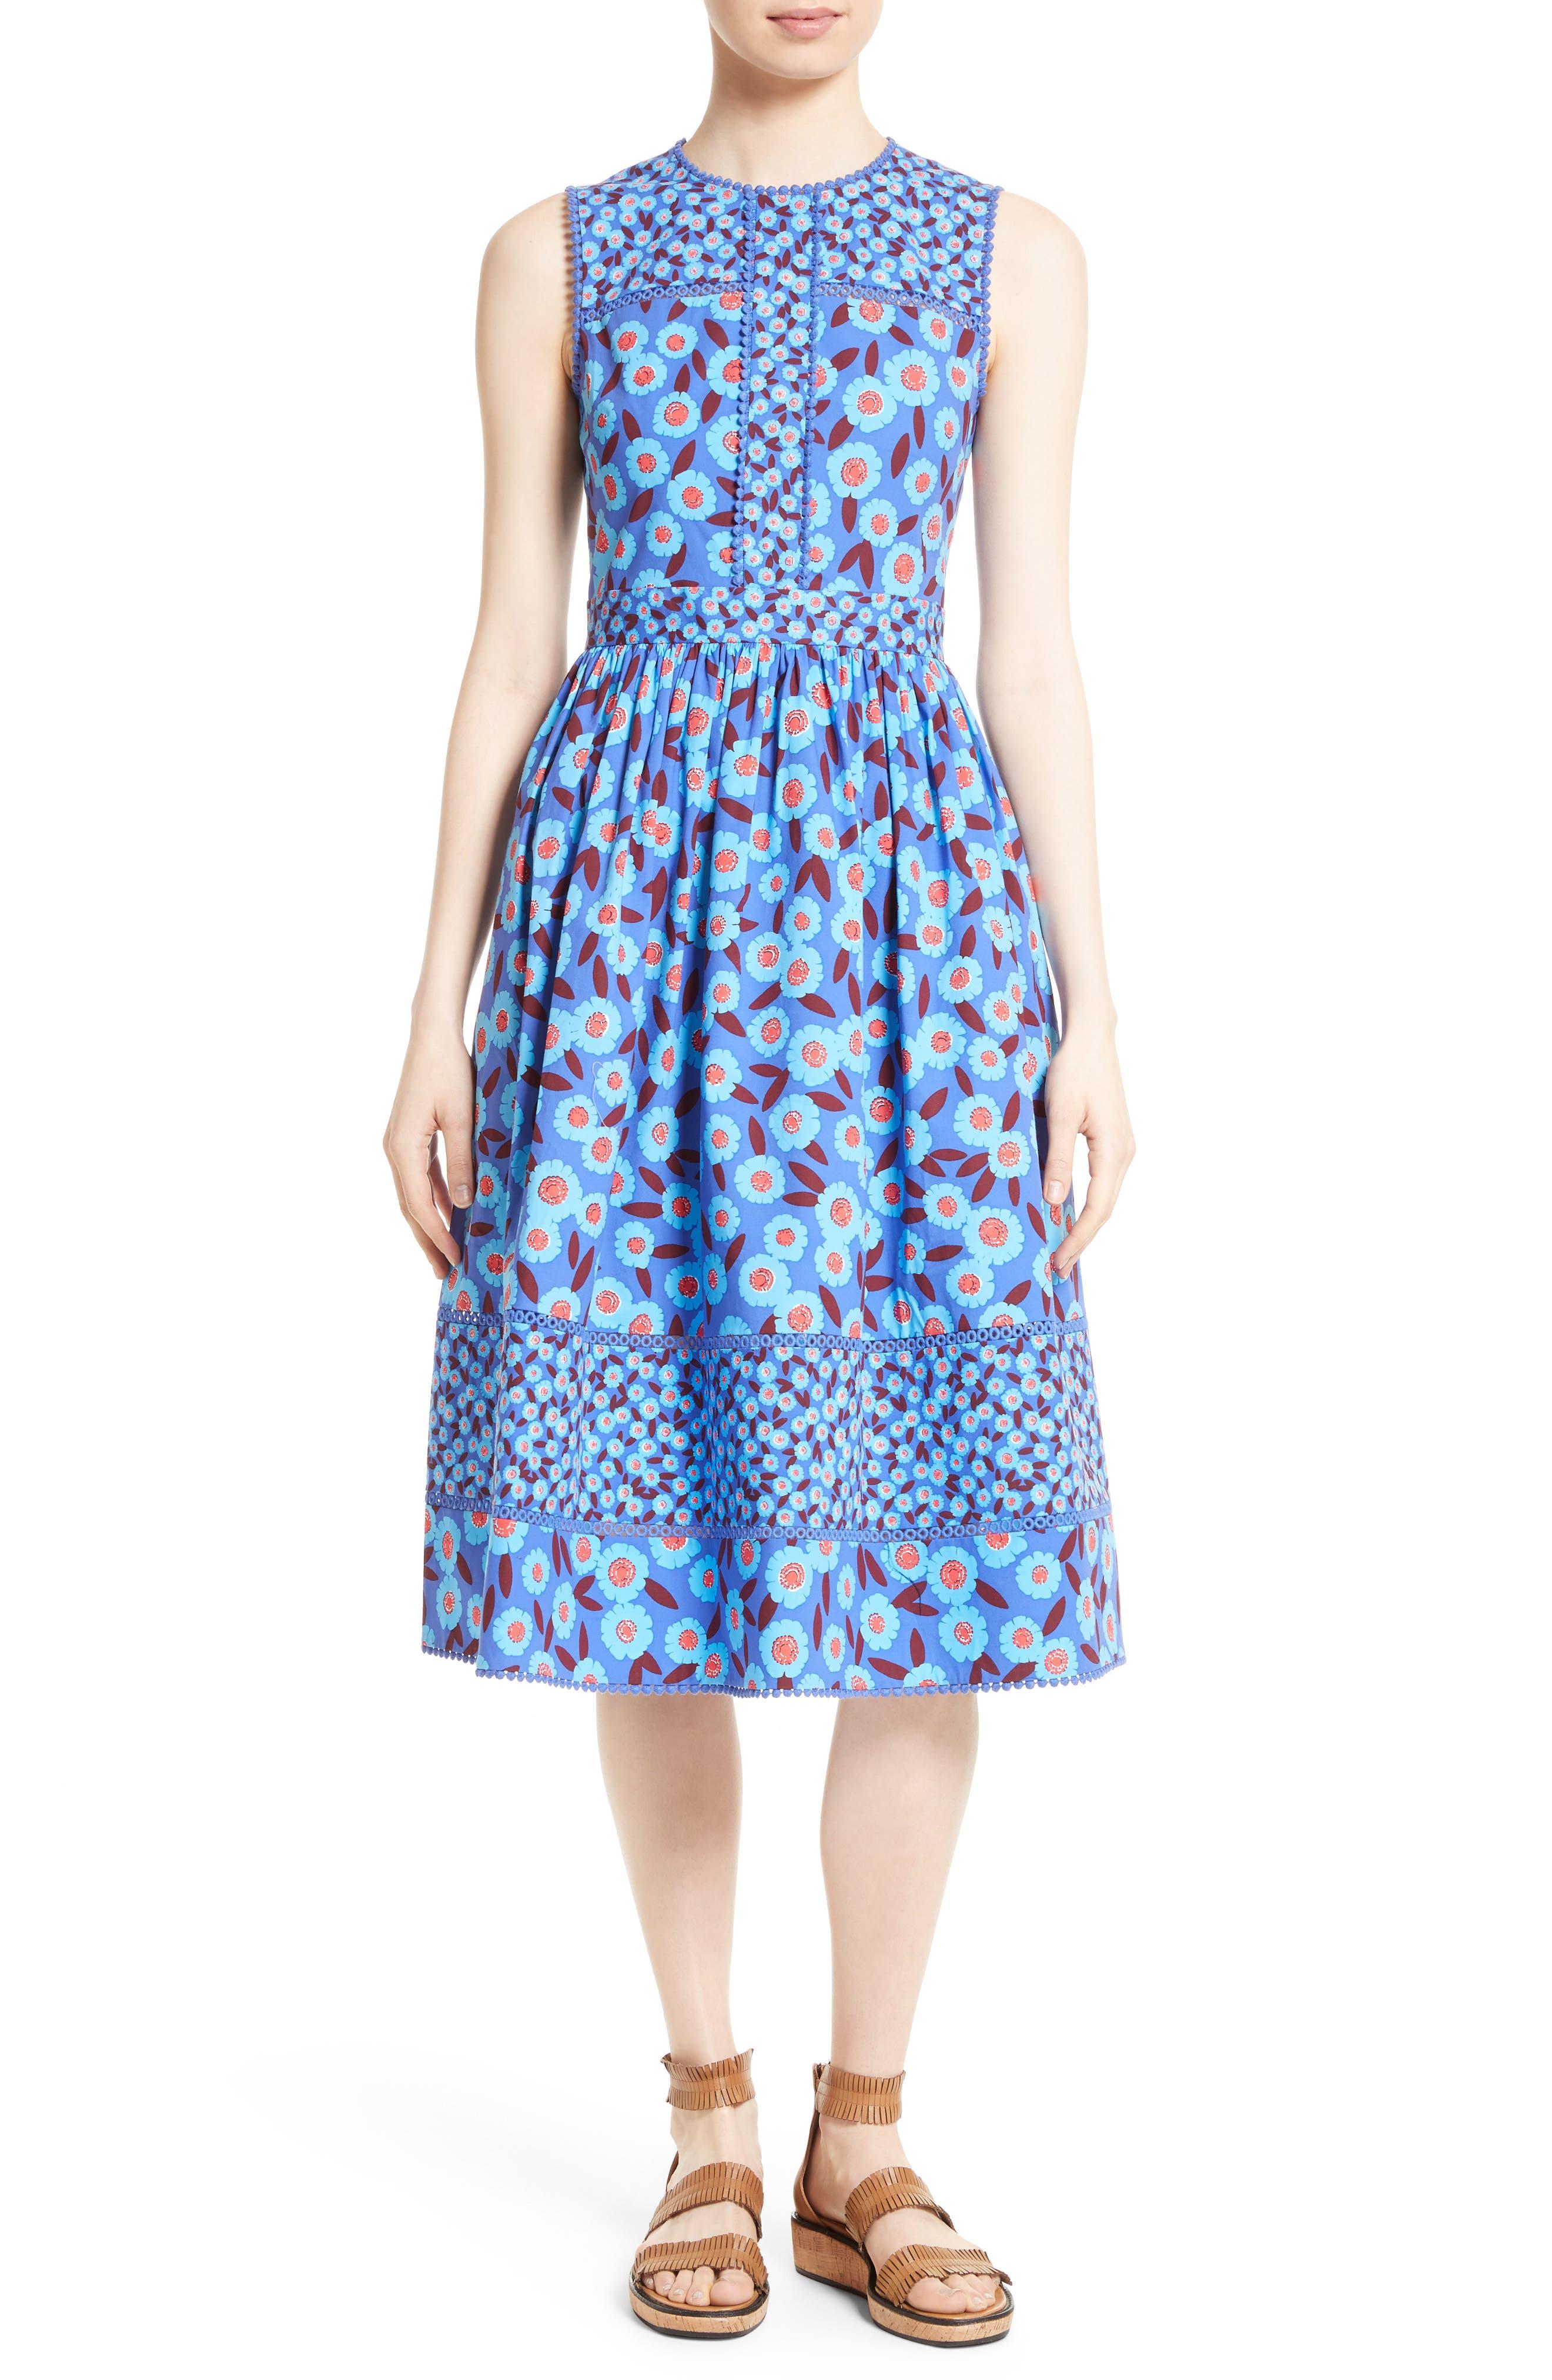 tangier floral midi dress, Main, color, 408